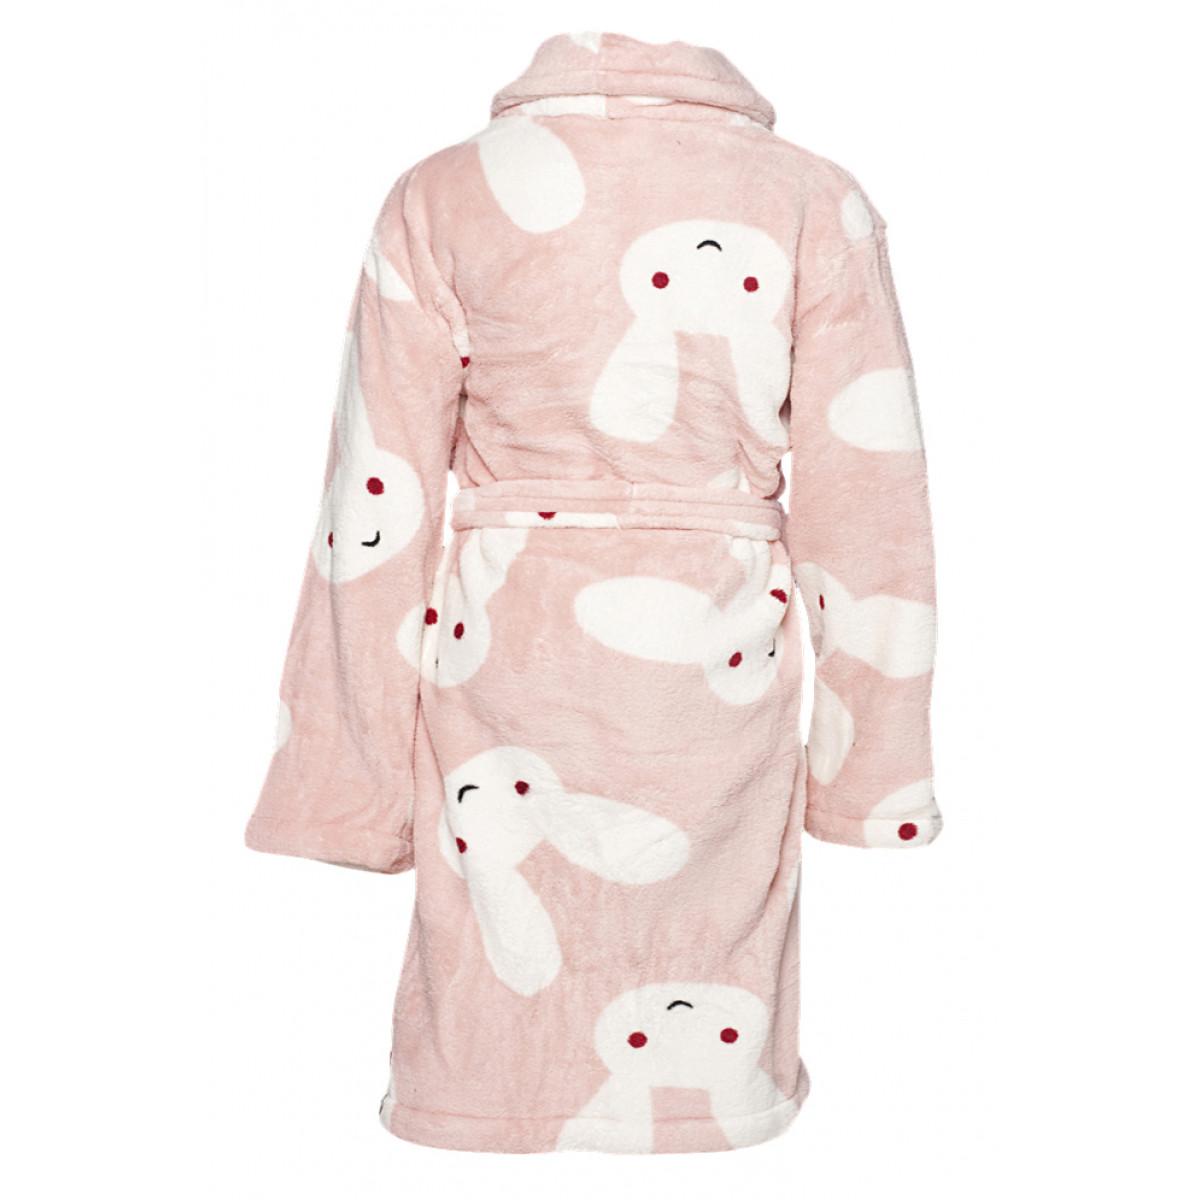 Kinder-badjas konijntjes